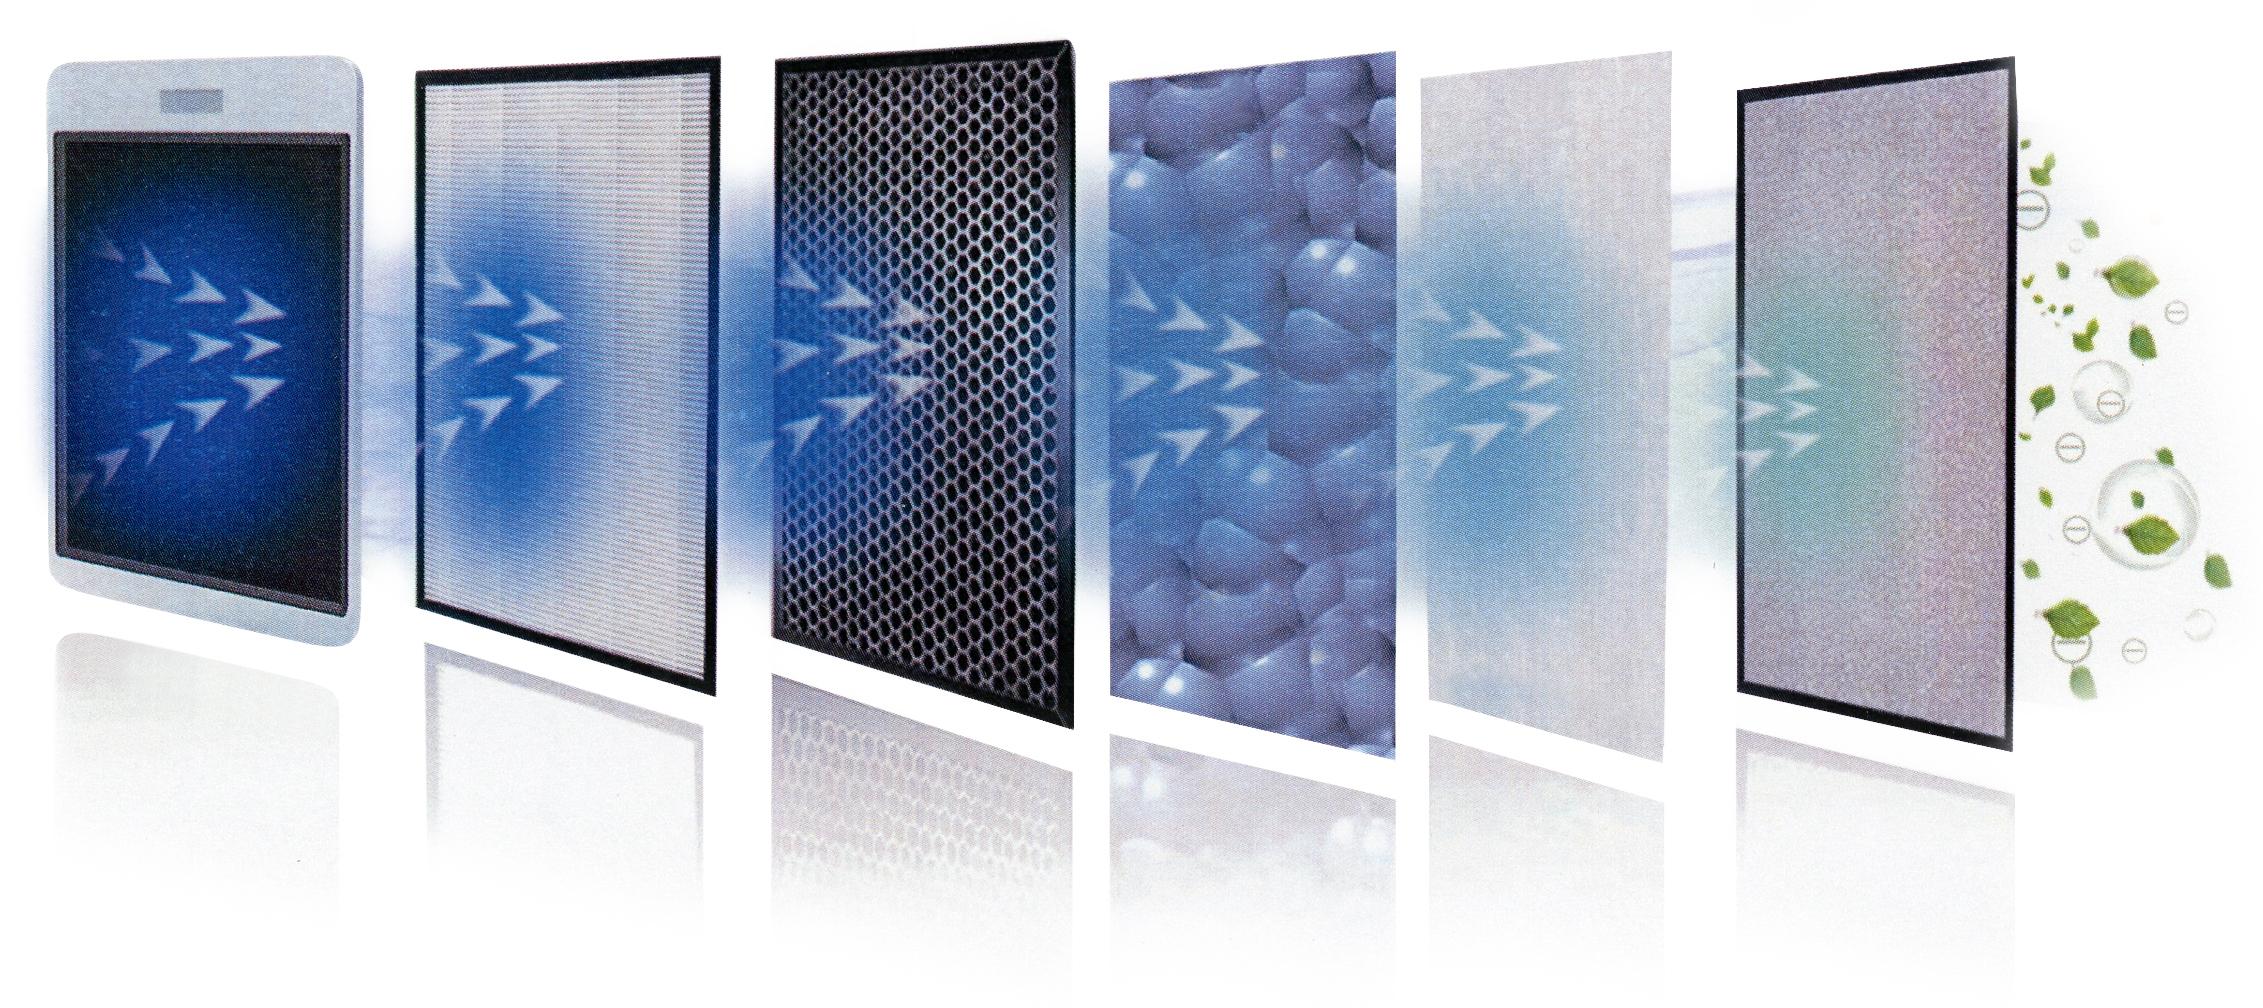 Nevoox LF 2000® UV-C Luftreiniger